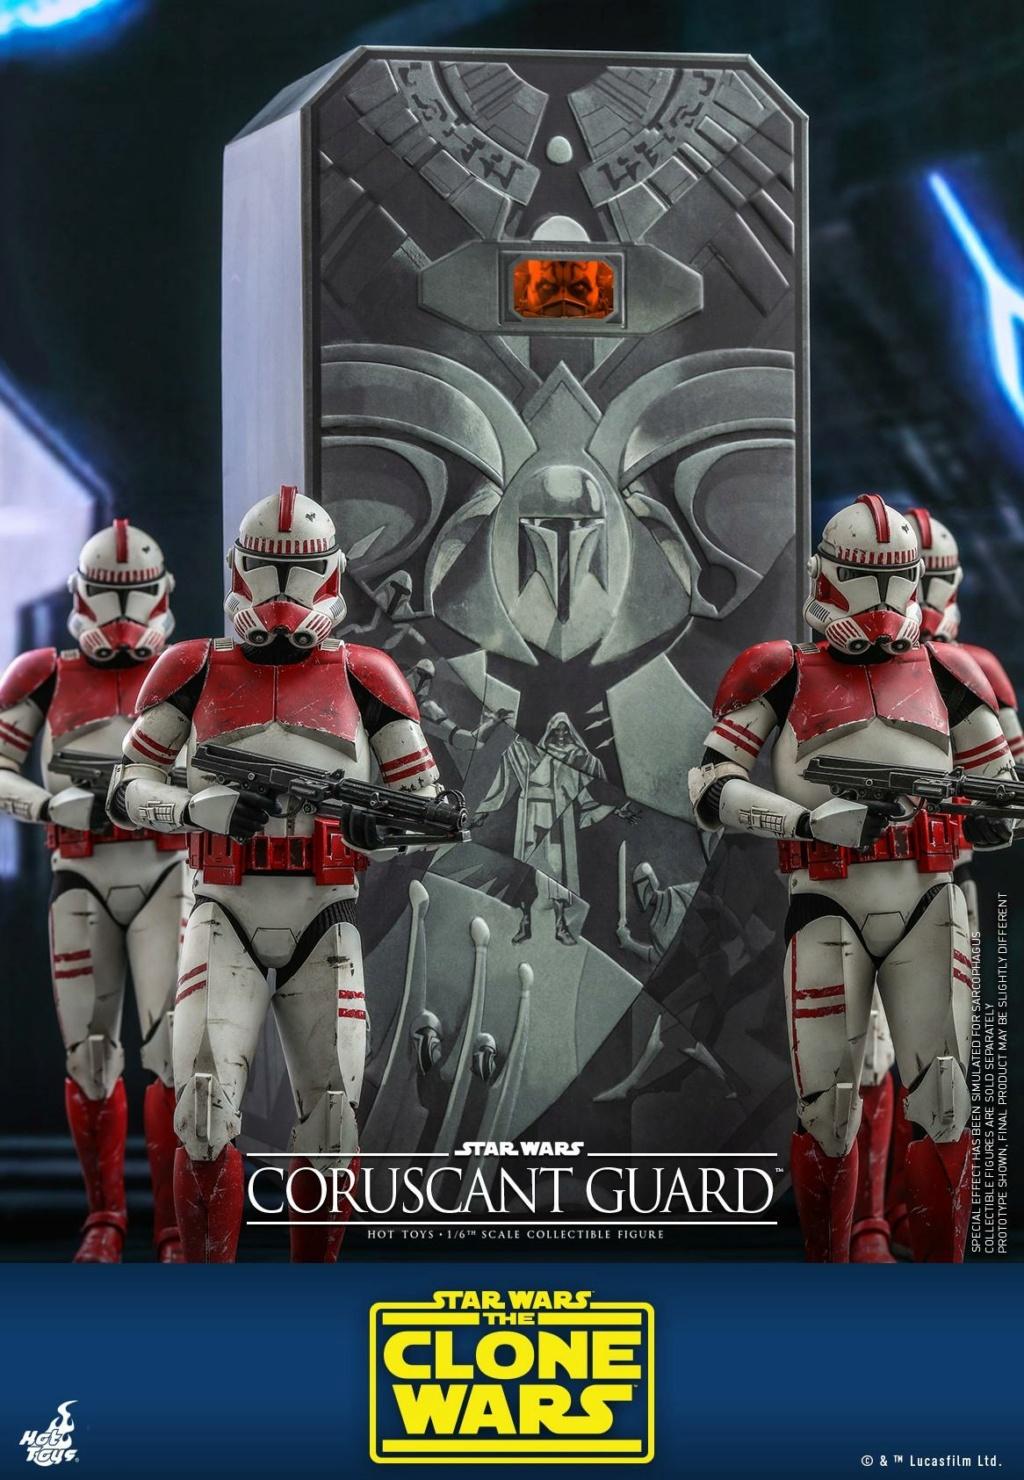 Coruscant Guard - 1/6th Figure - The Clone Wars - Hot Toys Corusc12